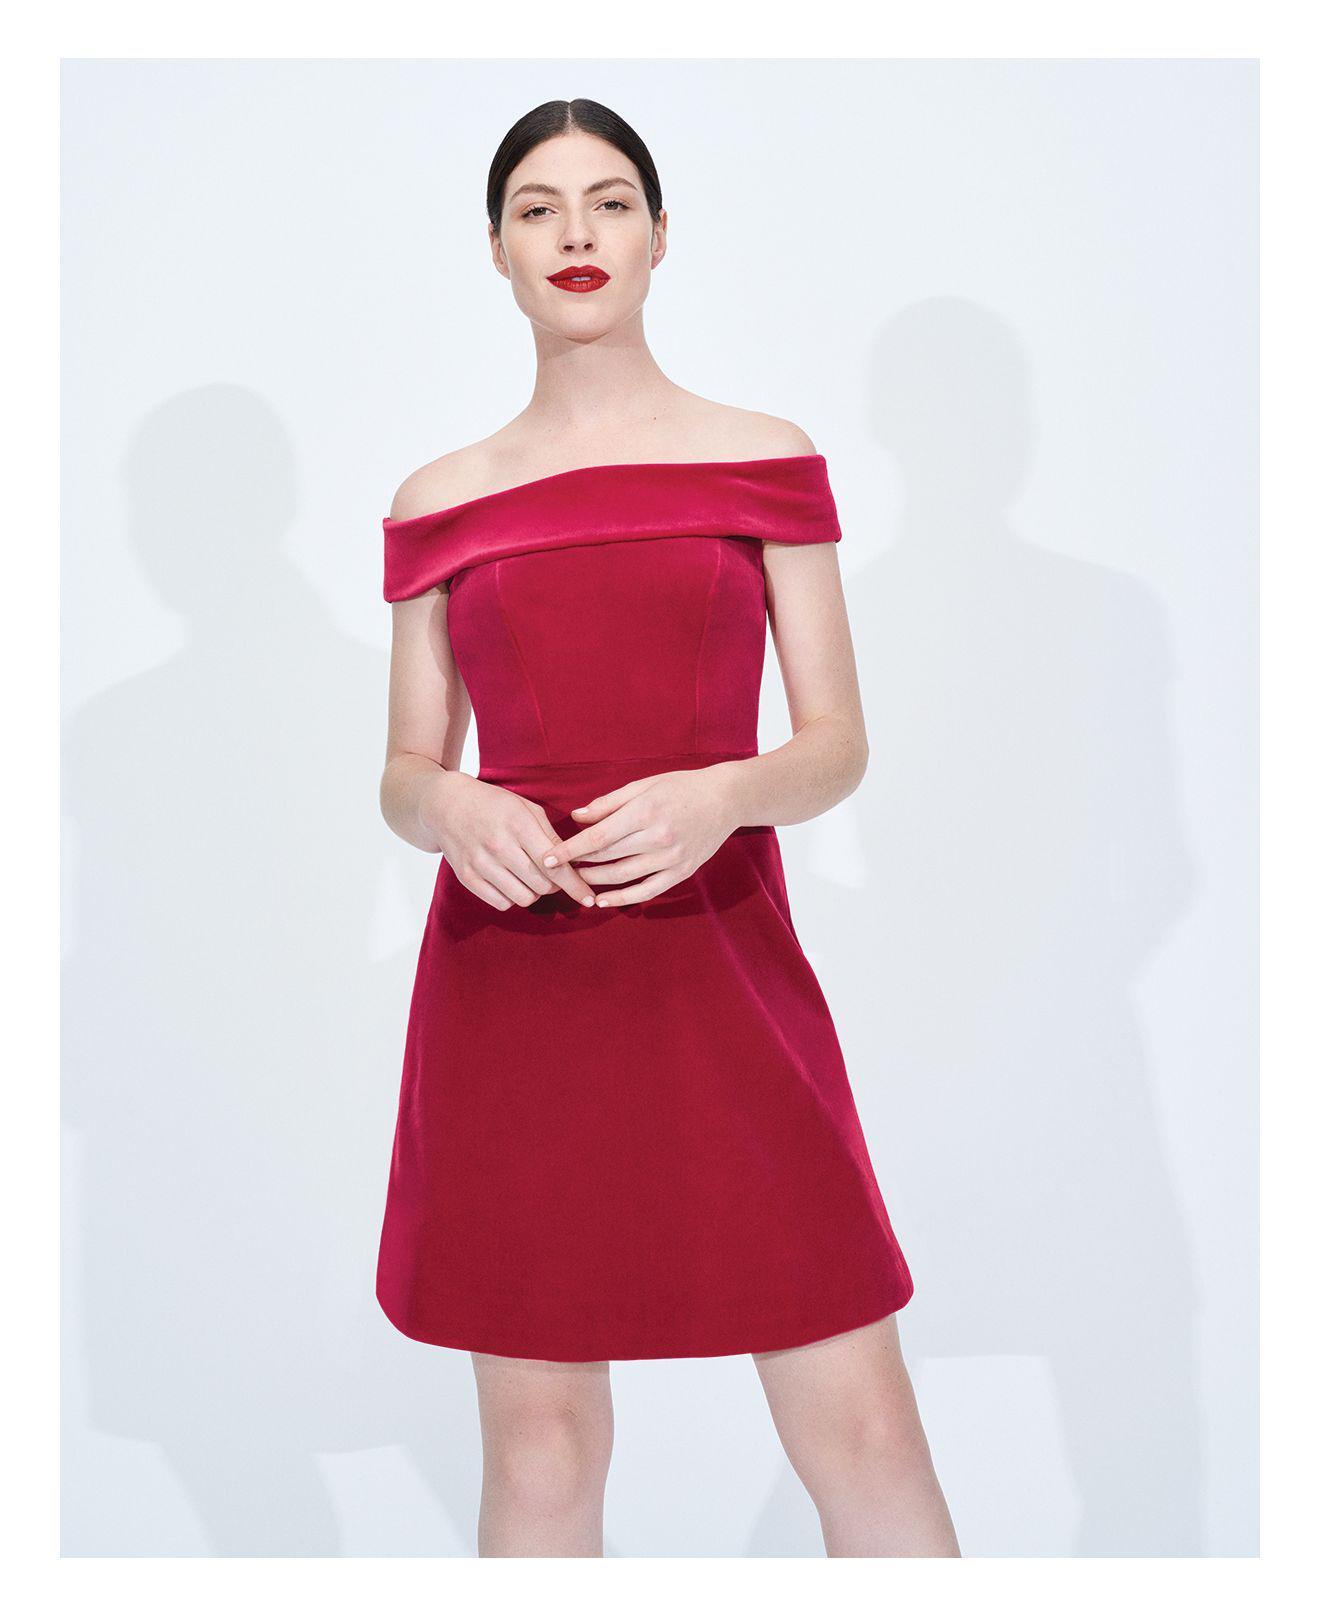 b0dbc93a7624 Lyst - Karen Millen Off-the-shoulder Velvet Bandeau A-line Dress in Pink